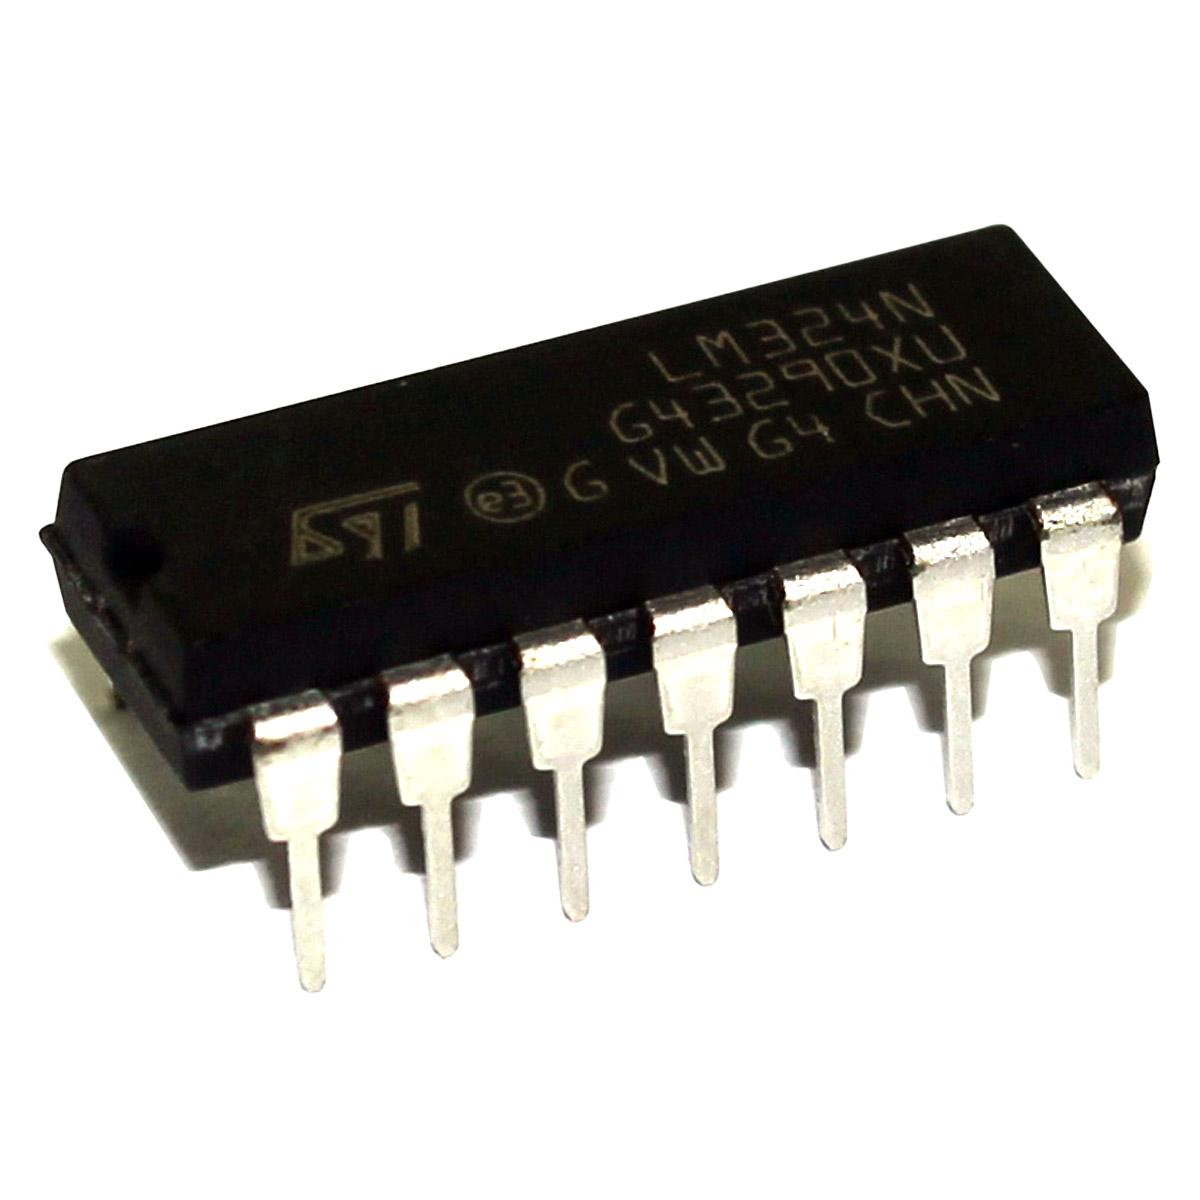 Circuito Integrado La78041 : Circuito integrado ca eletropeças comercial